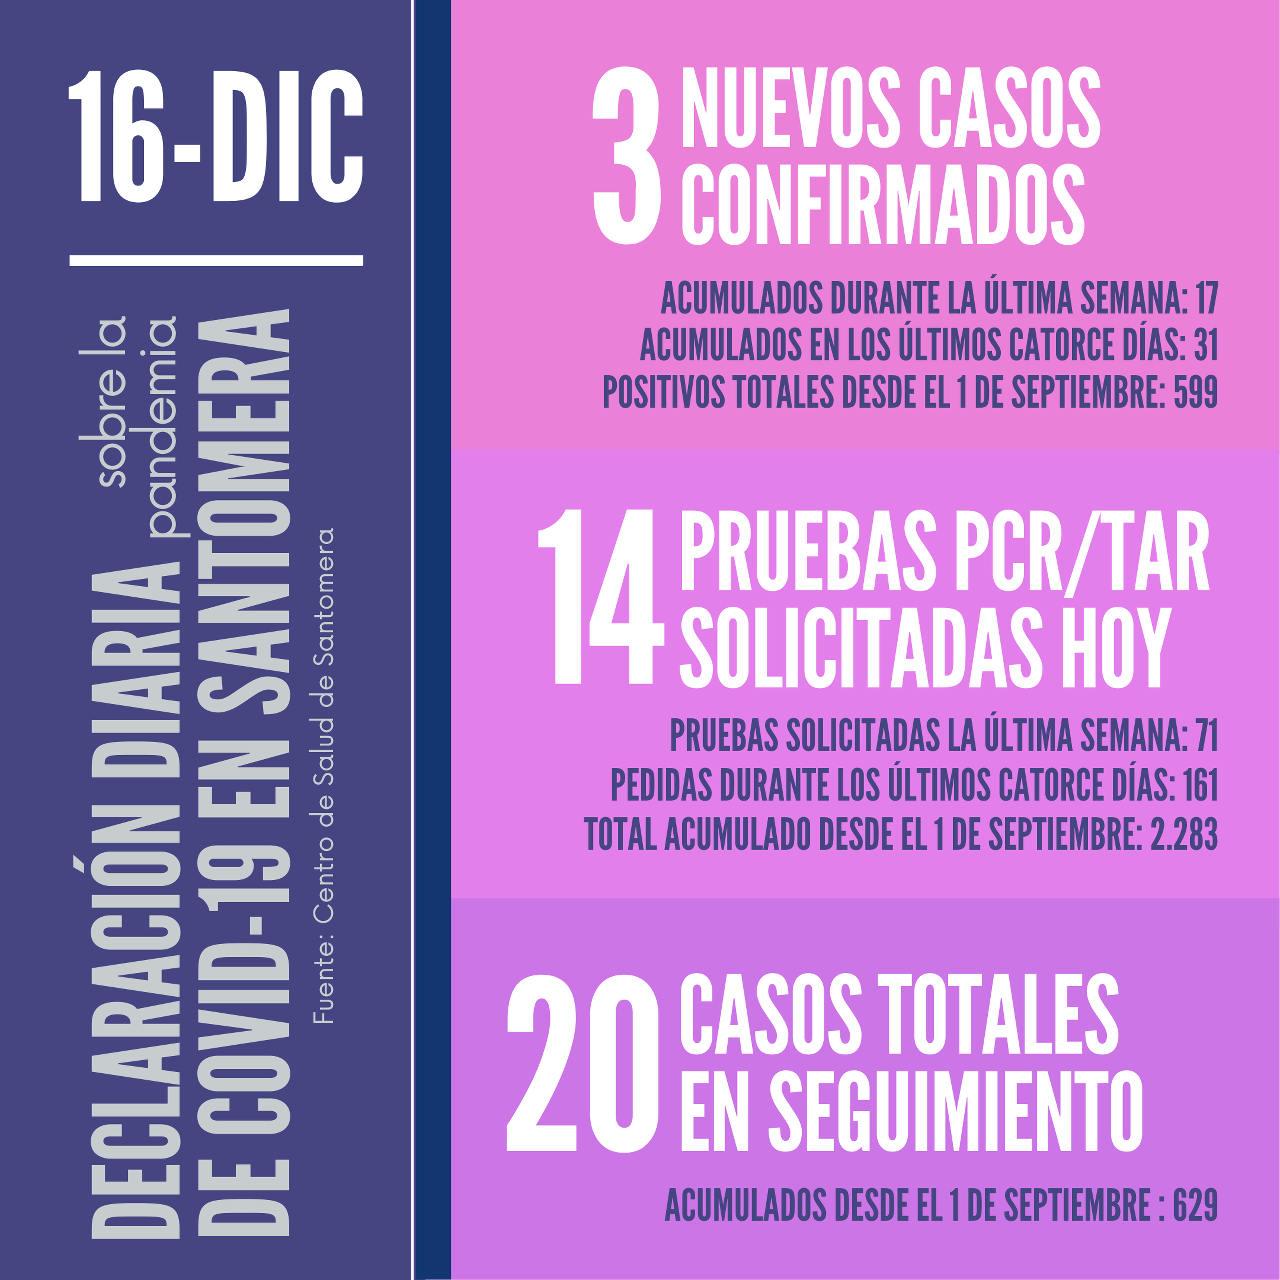 20201216_Datos COVID-19 Santomera